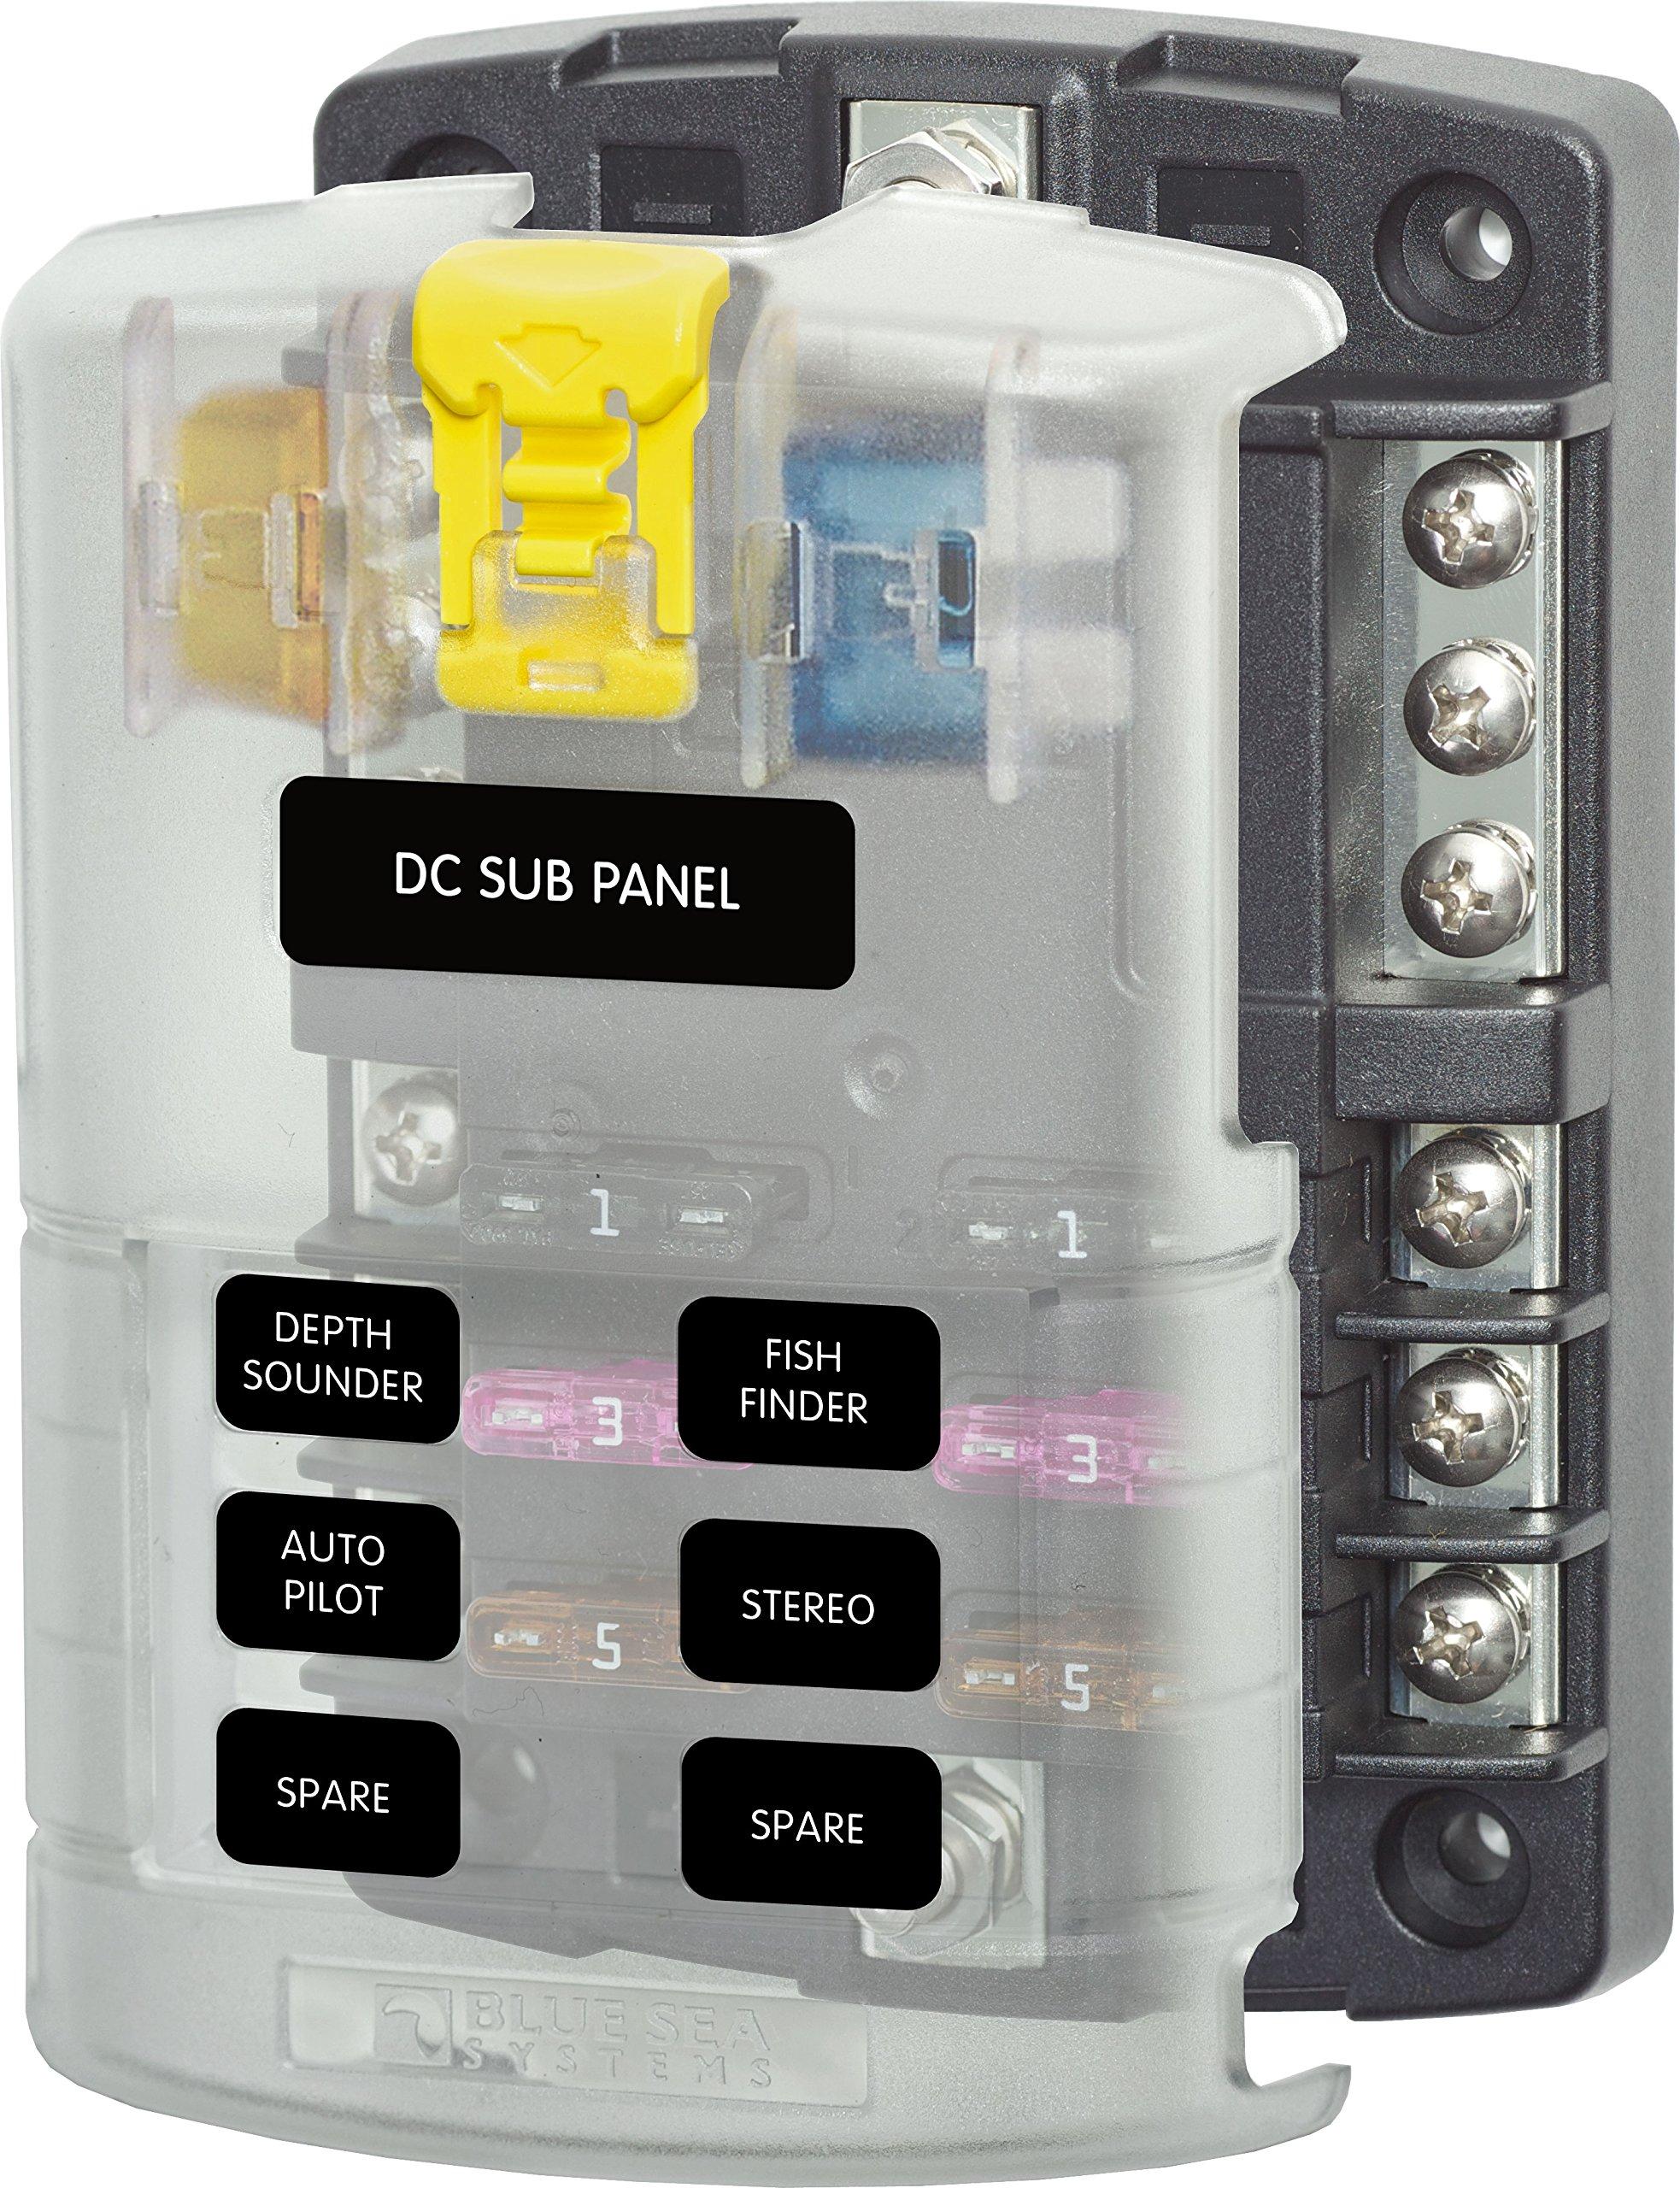 Blue Sea 5025 ST Blade Fuse Block w/Cover - 6 Circuit w/Negative Bus